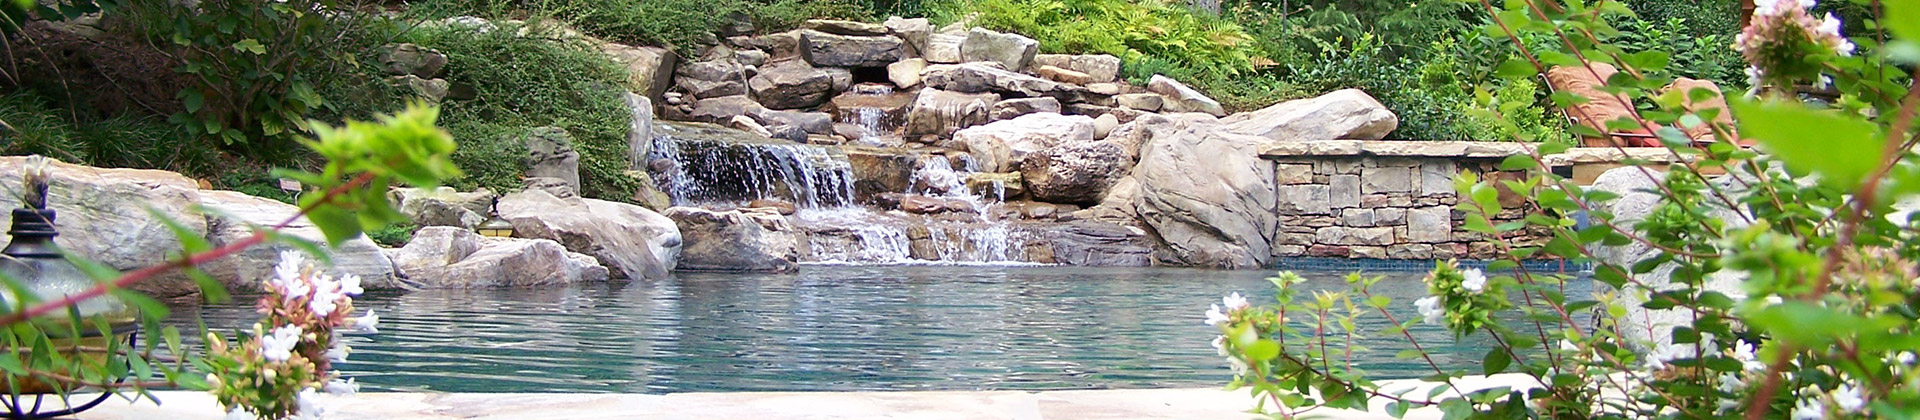 sld-pool